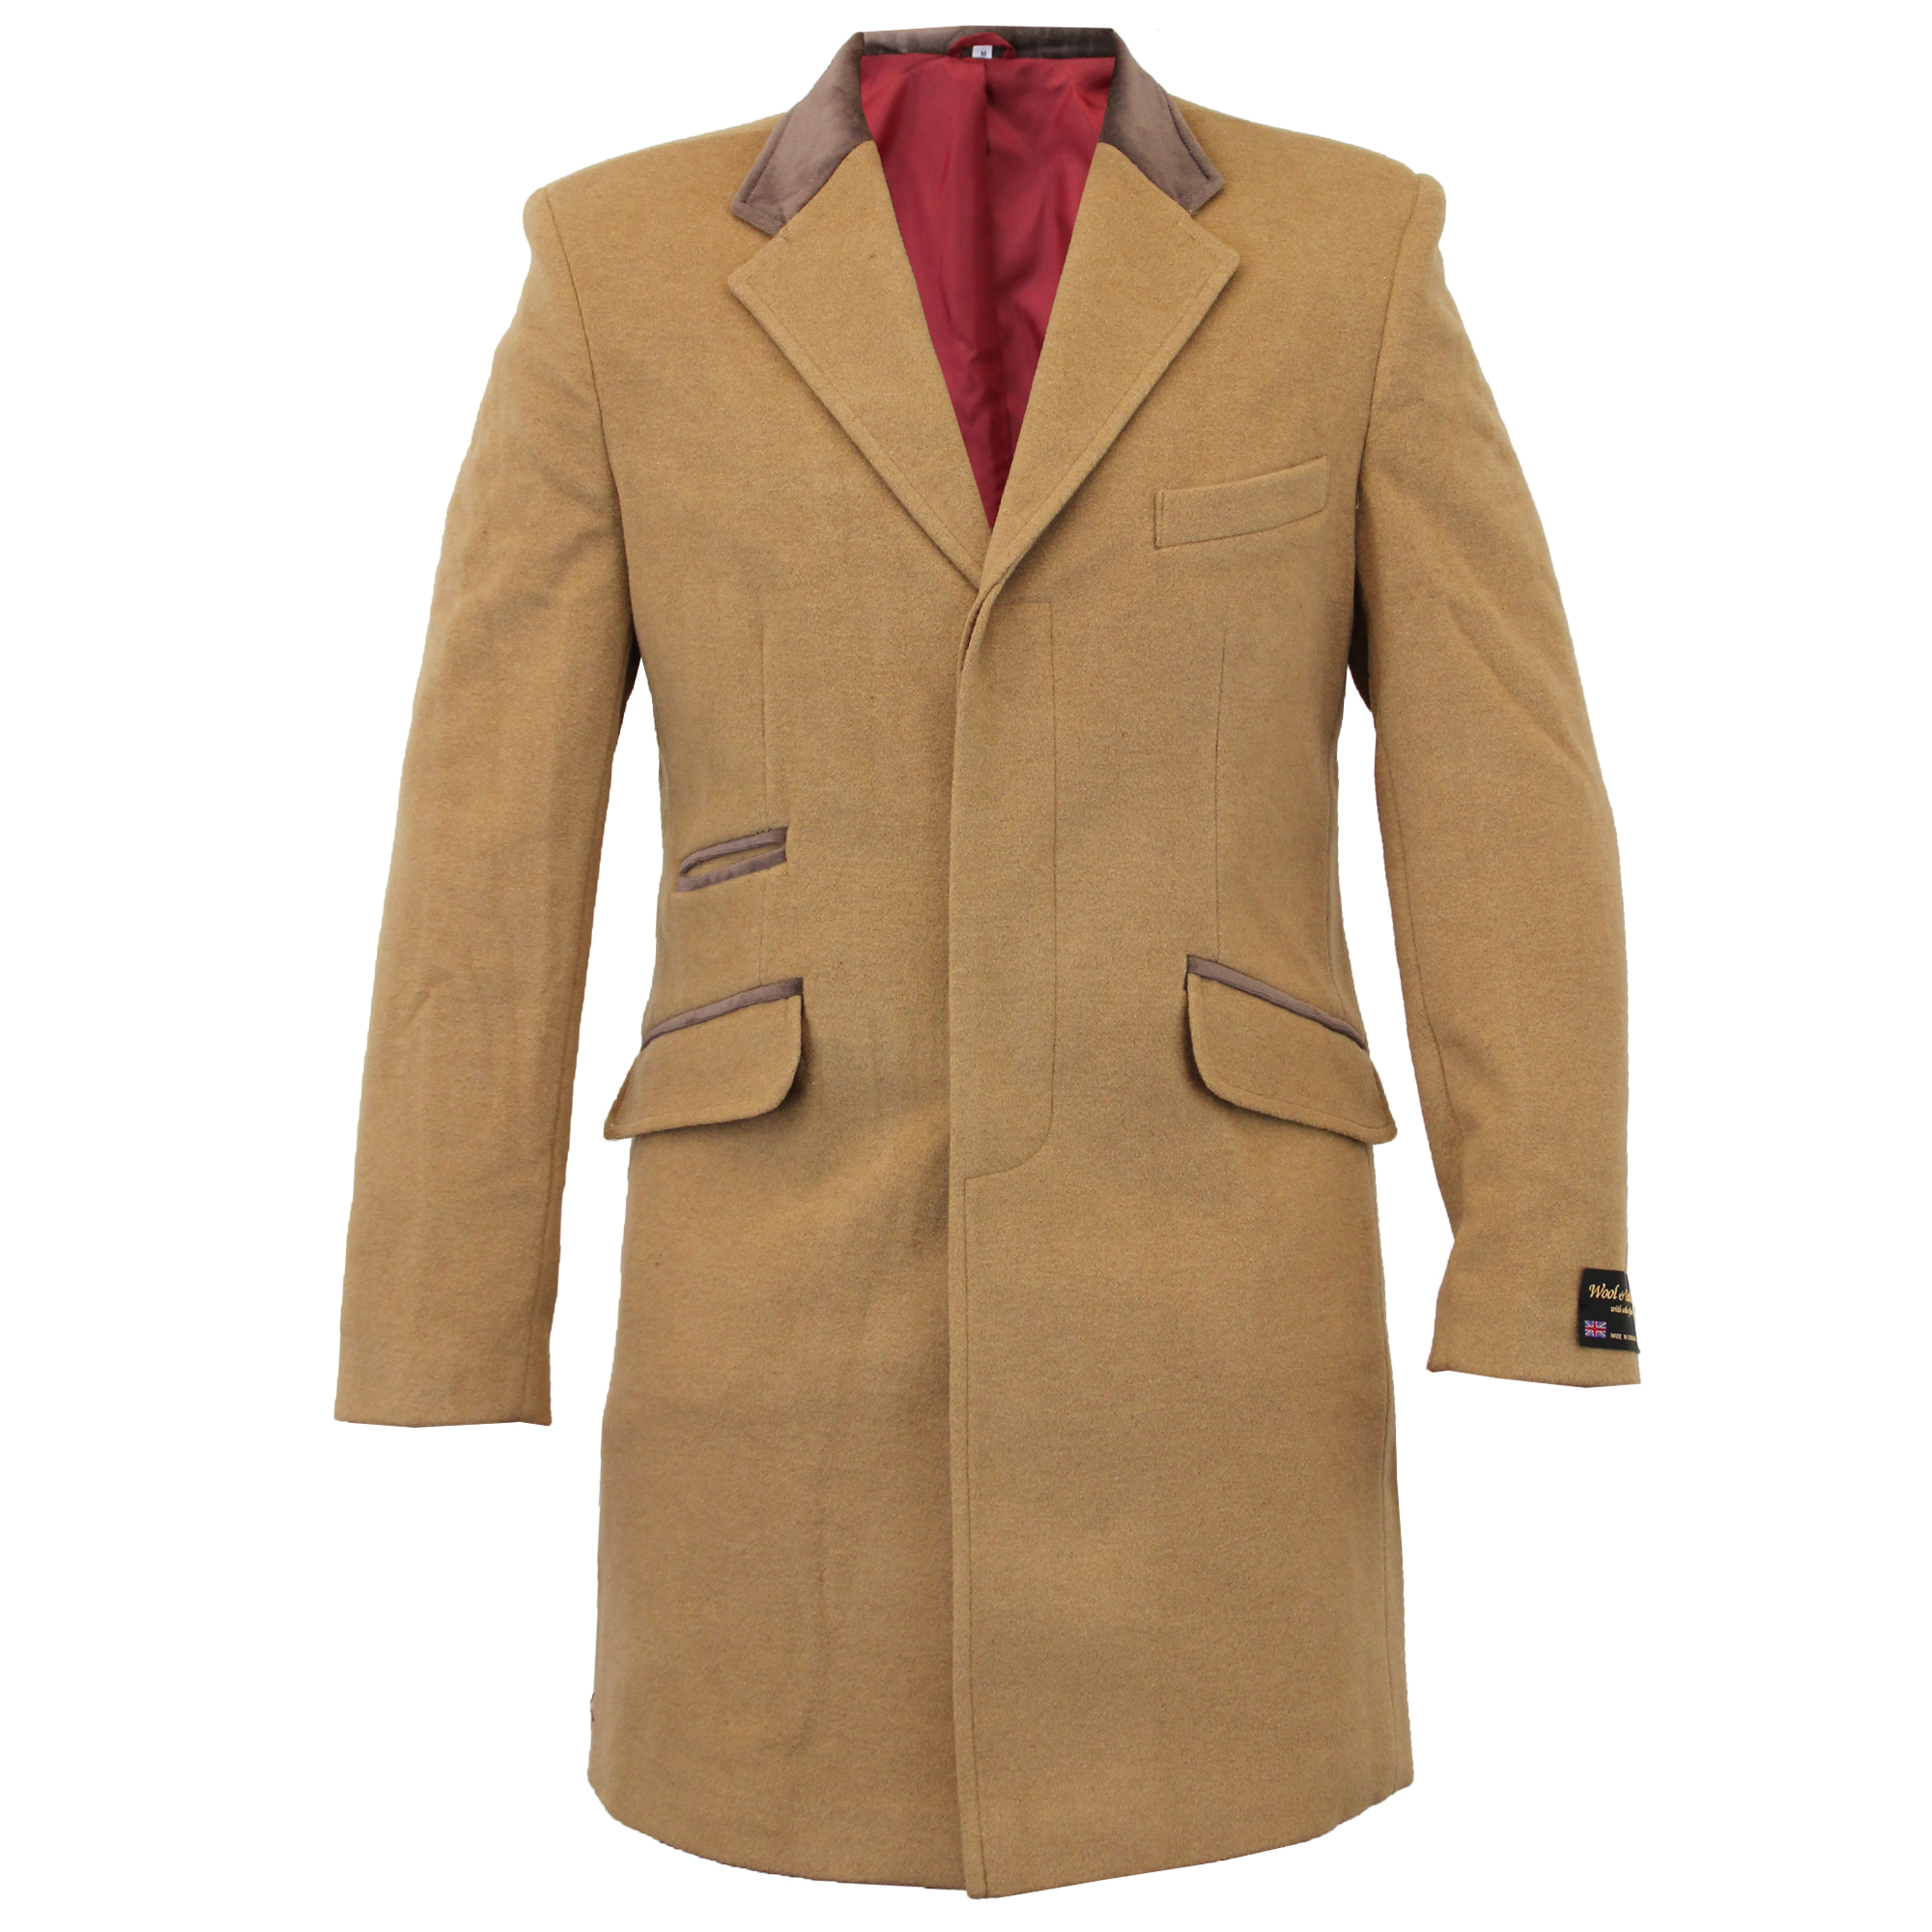 Winter Jackets From MoosejawFree Shipping Over $35· 10% Back in Rewards· Price match· Lifetime returnsTypes: Down Jackets, Fleece Jackets, Insulated Jackets, Rain Jackets, Ski Jackets.